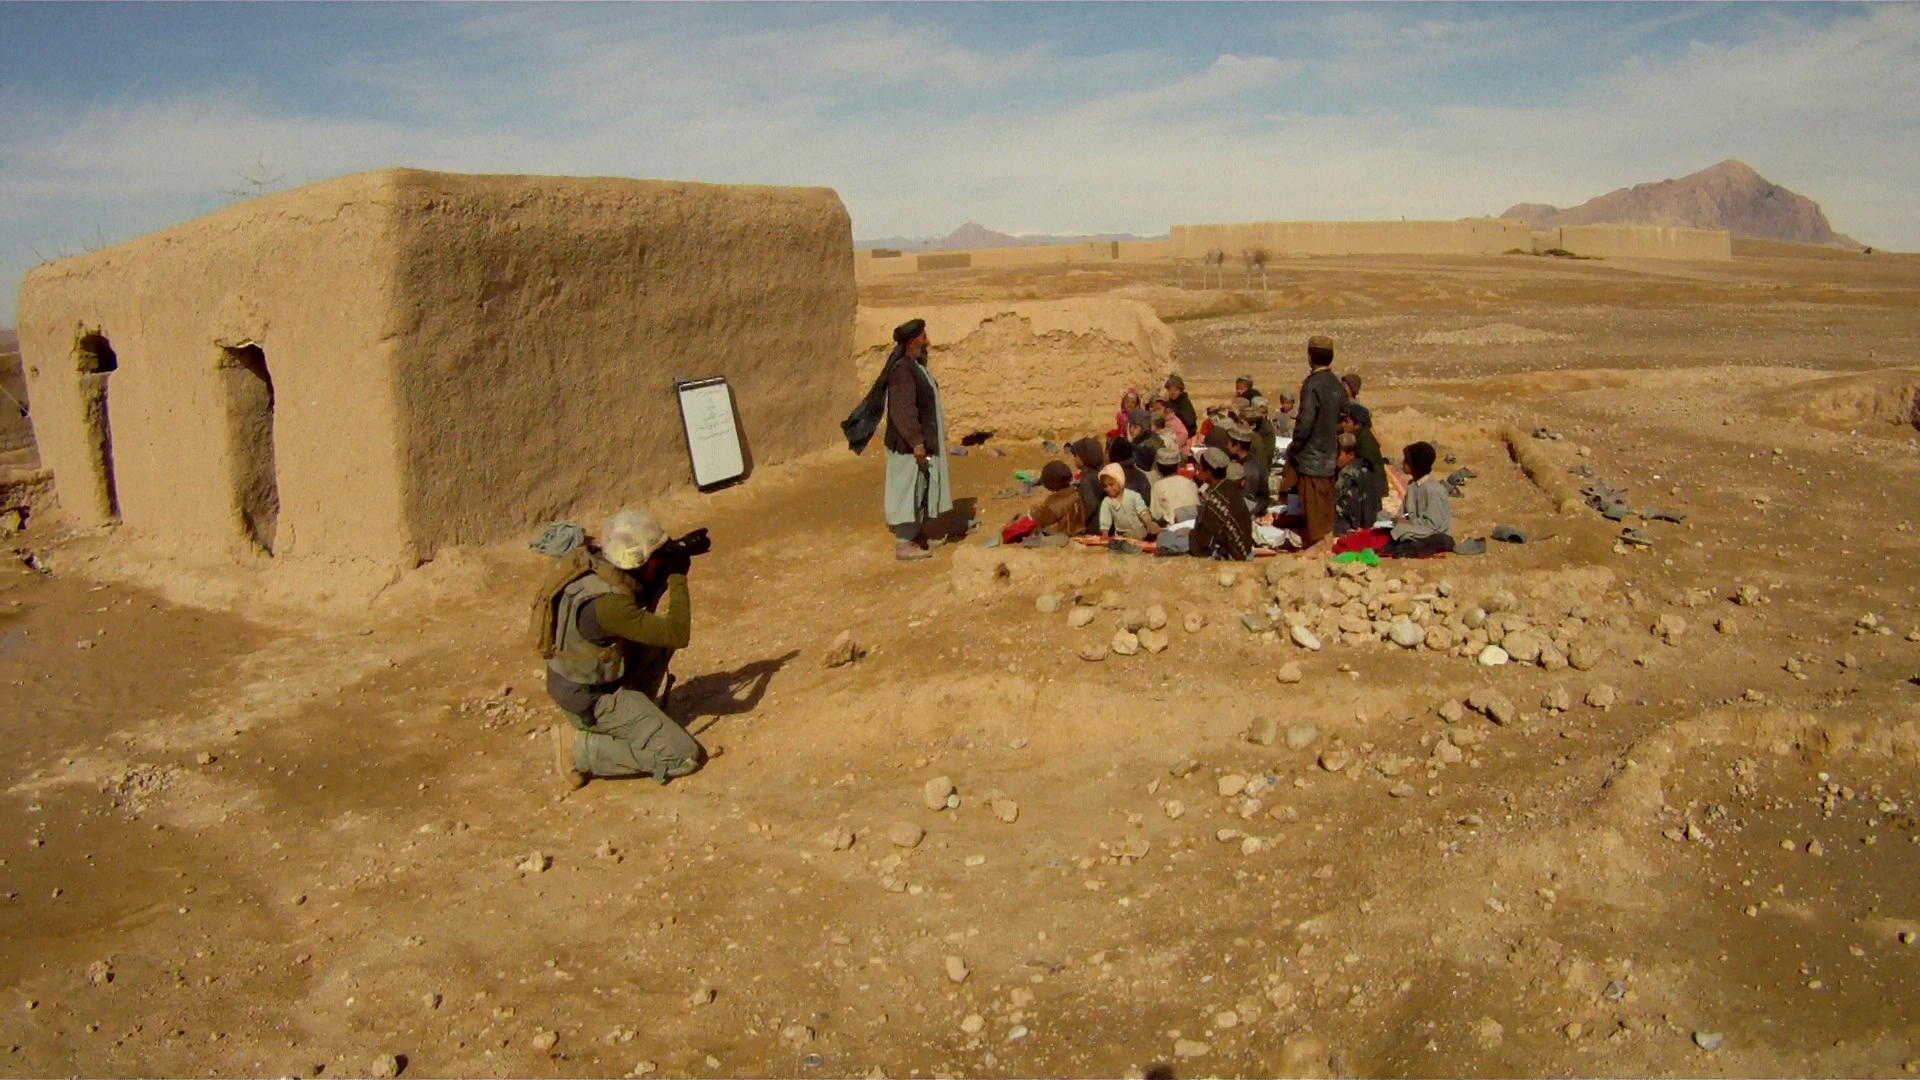 Finbbarr O'Reilly - class in Afghanistan